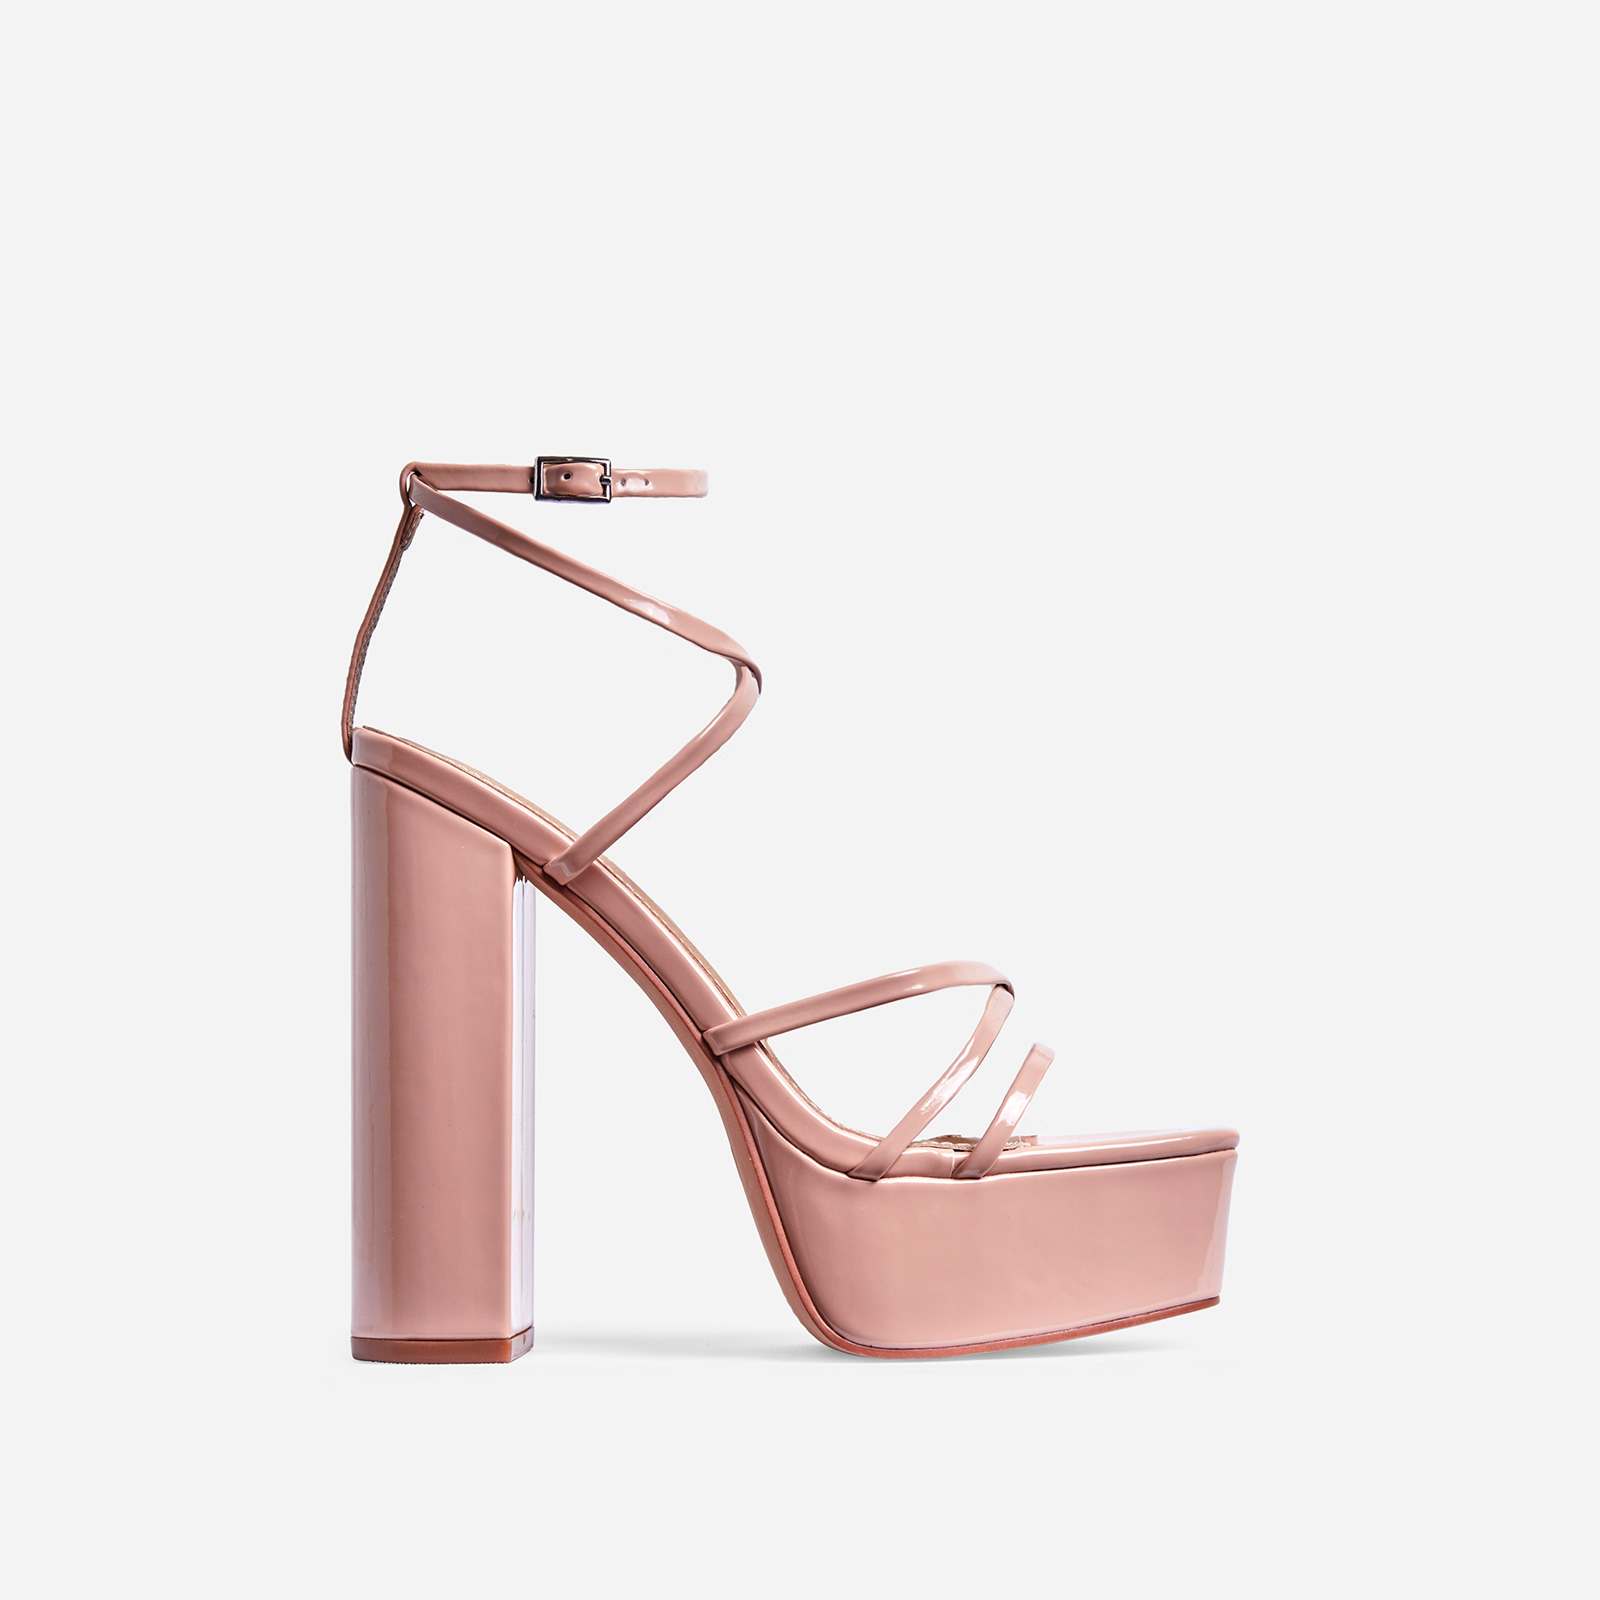 Leona Square Toe Platform Block Heel In Nude Patent